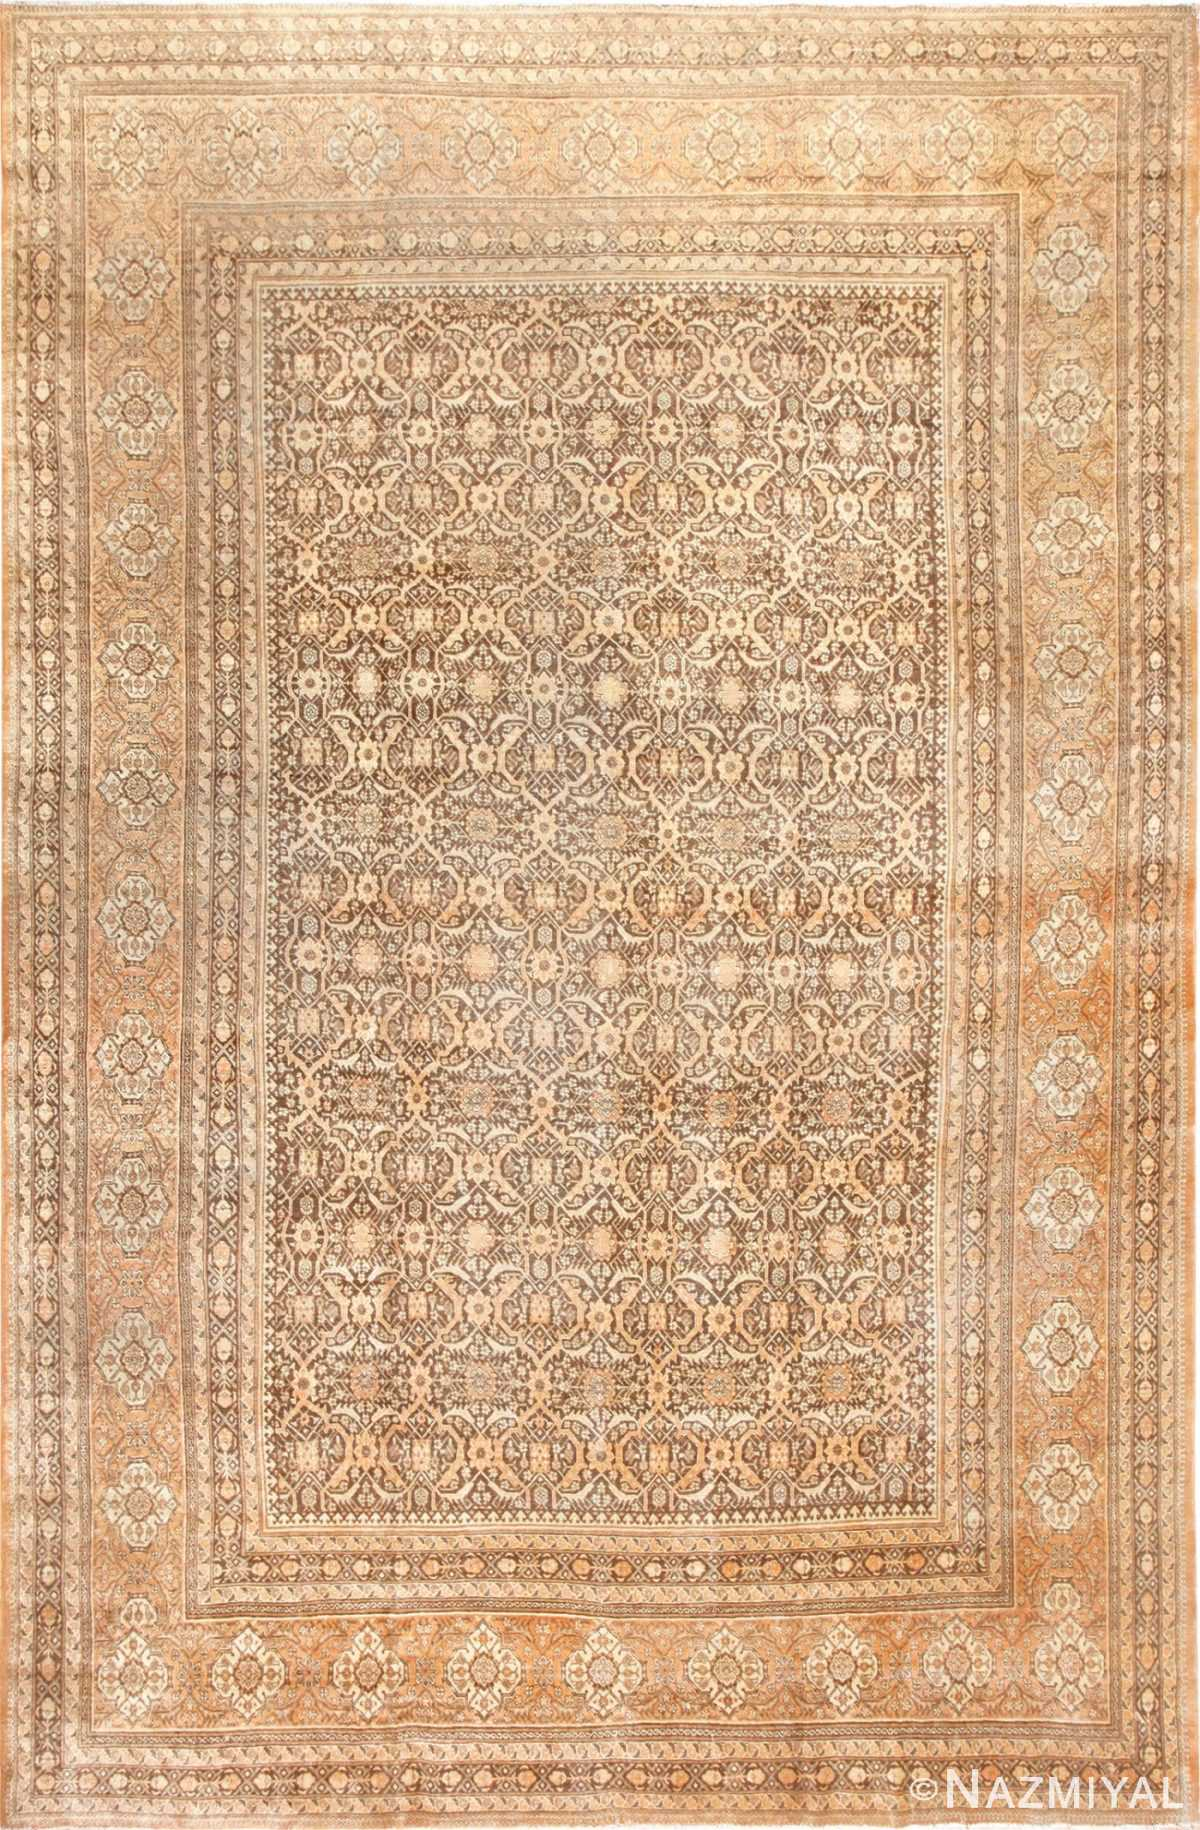 Fine and Decorative Antique Persian Tabriz Rug 50625 Nazmiyal